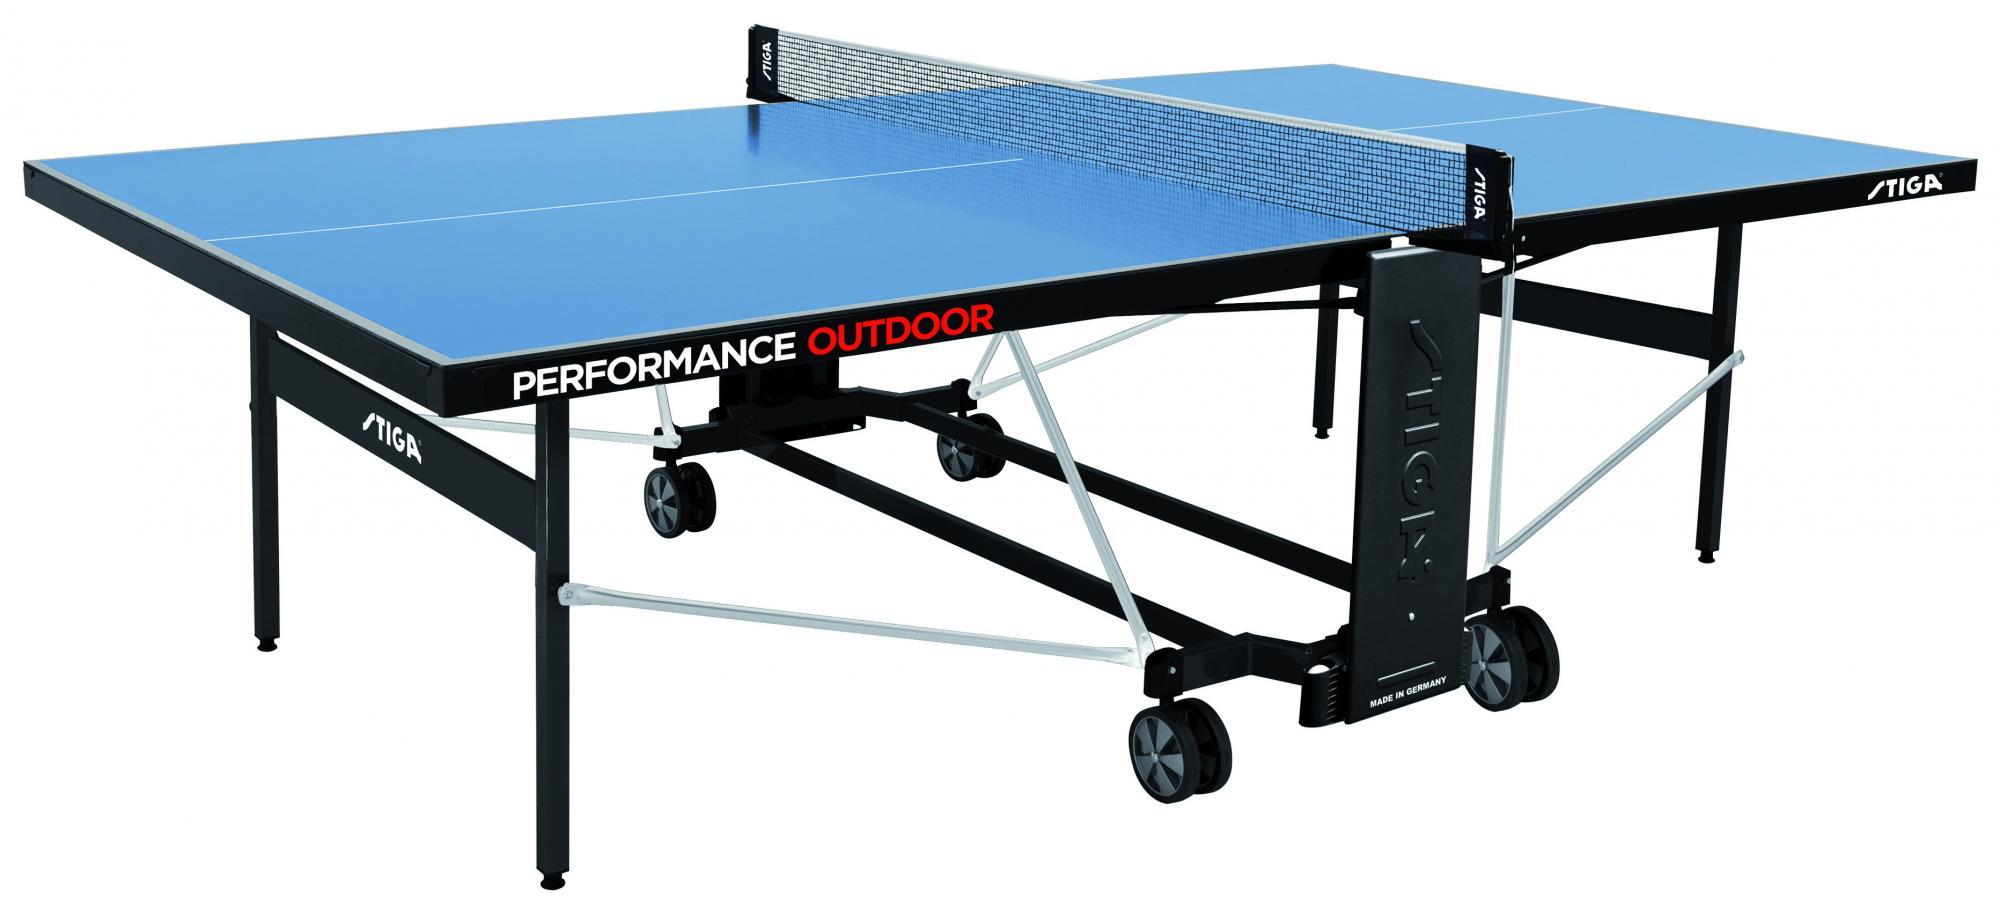 Pingpongový stůl venkovní STIGA PERFORMANCE OUTDOOR